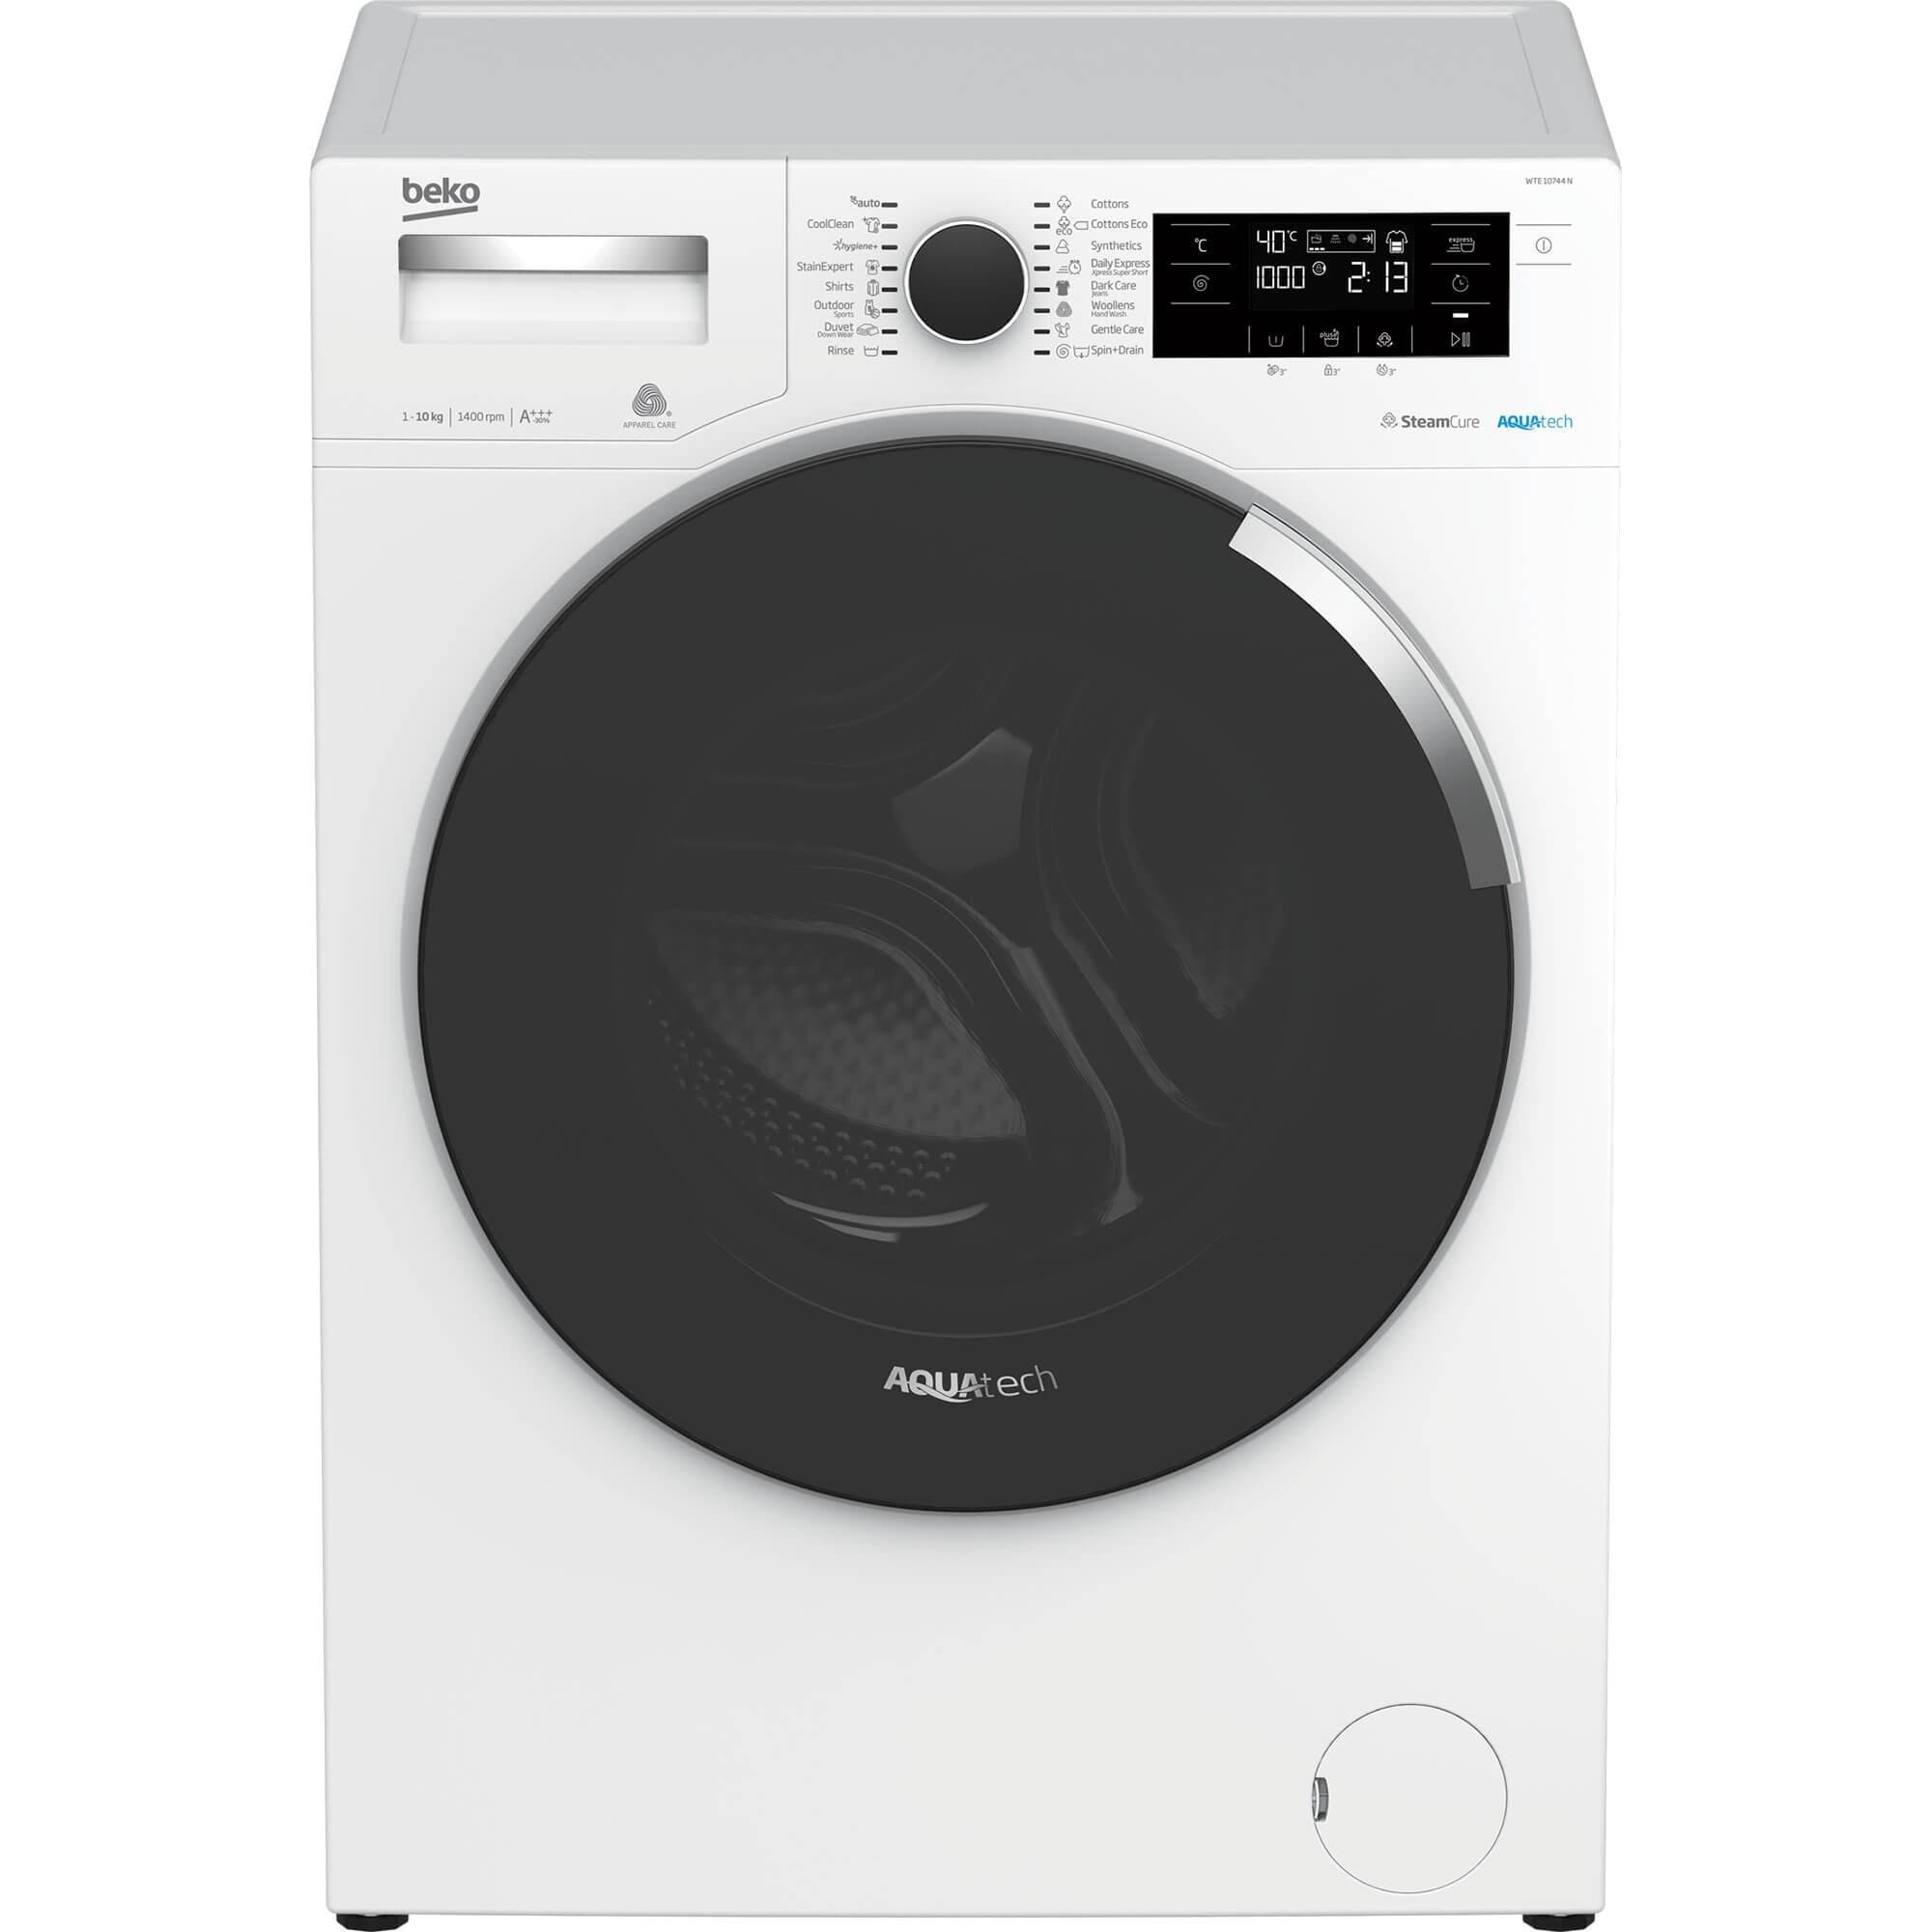 Fotografie Masina de spalat rufe Beko WTE10744N, 10 kg, 1400 RPM, Clasa A+++, AquaTech™ SteamCure™, ADDGarment, Motor ProSmart Inverter, Alb